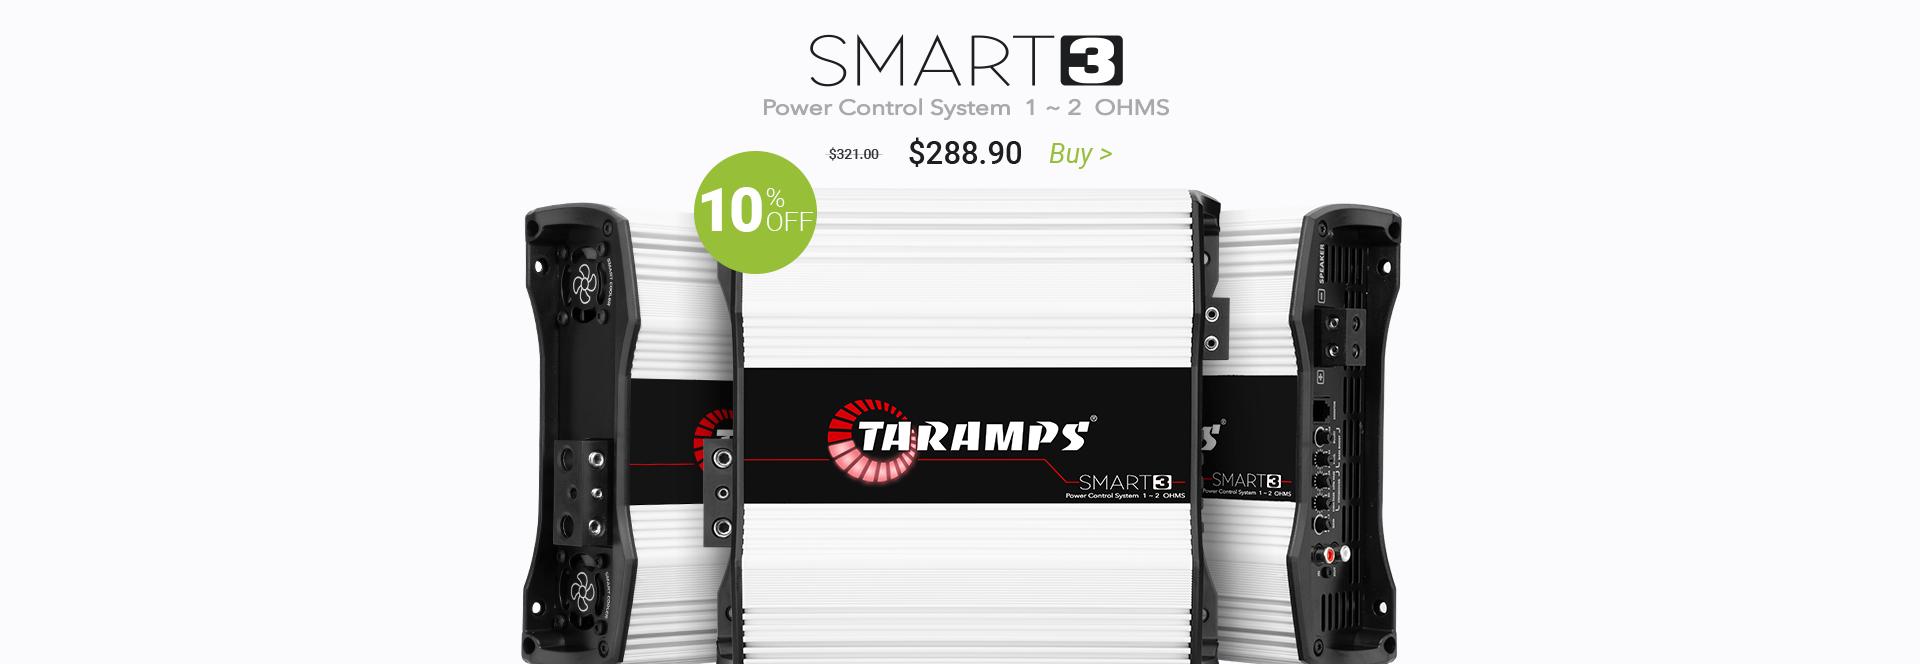 Banner Smart3